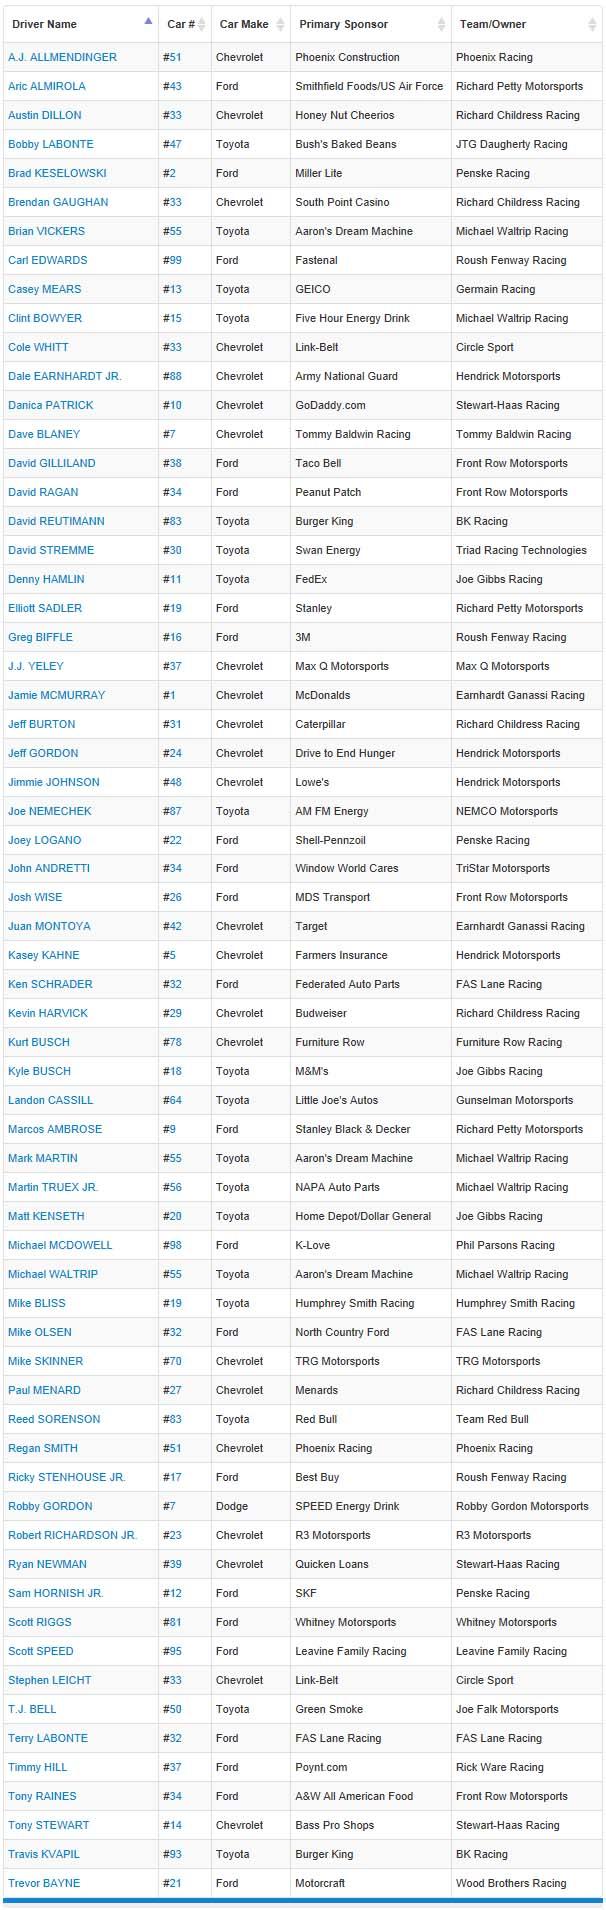 2013 NASCAR Drivers List